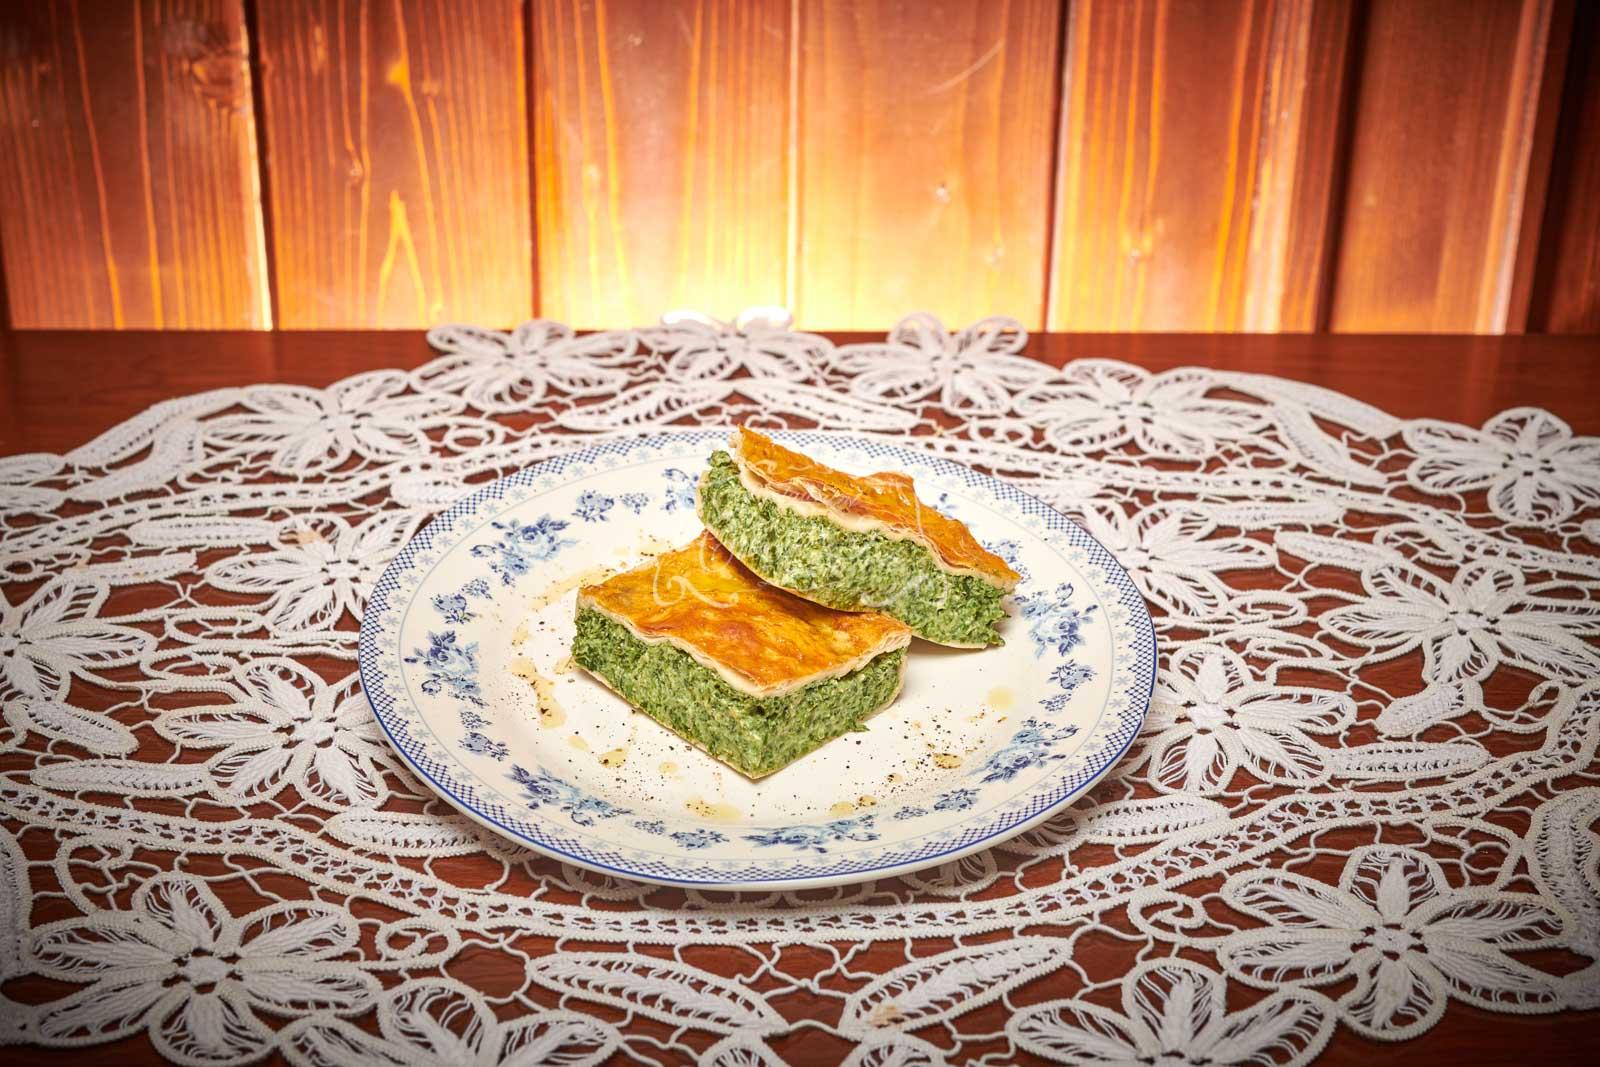 Tarta cu spanac 0.8 kg livram acasa ori la birou in Timisoara